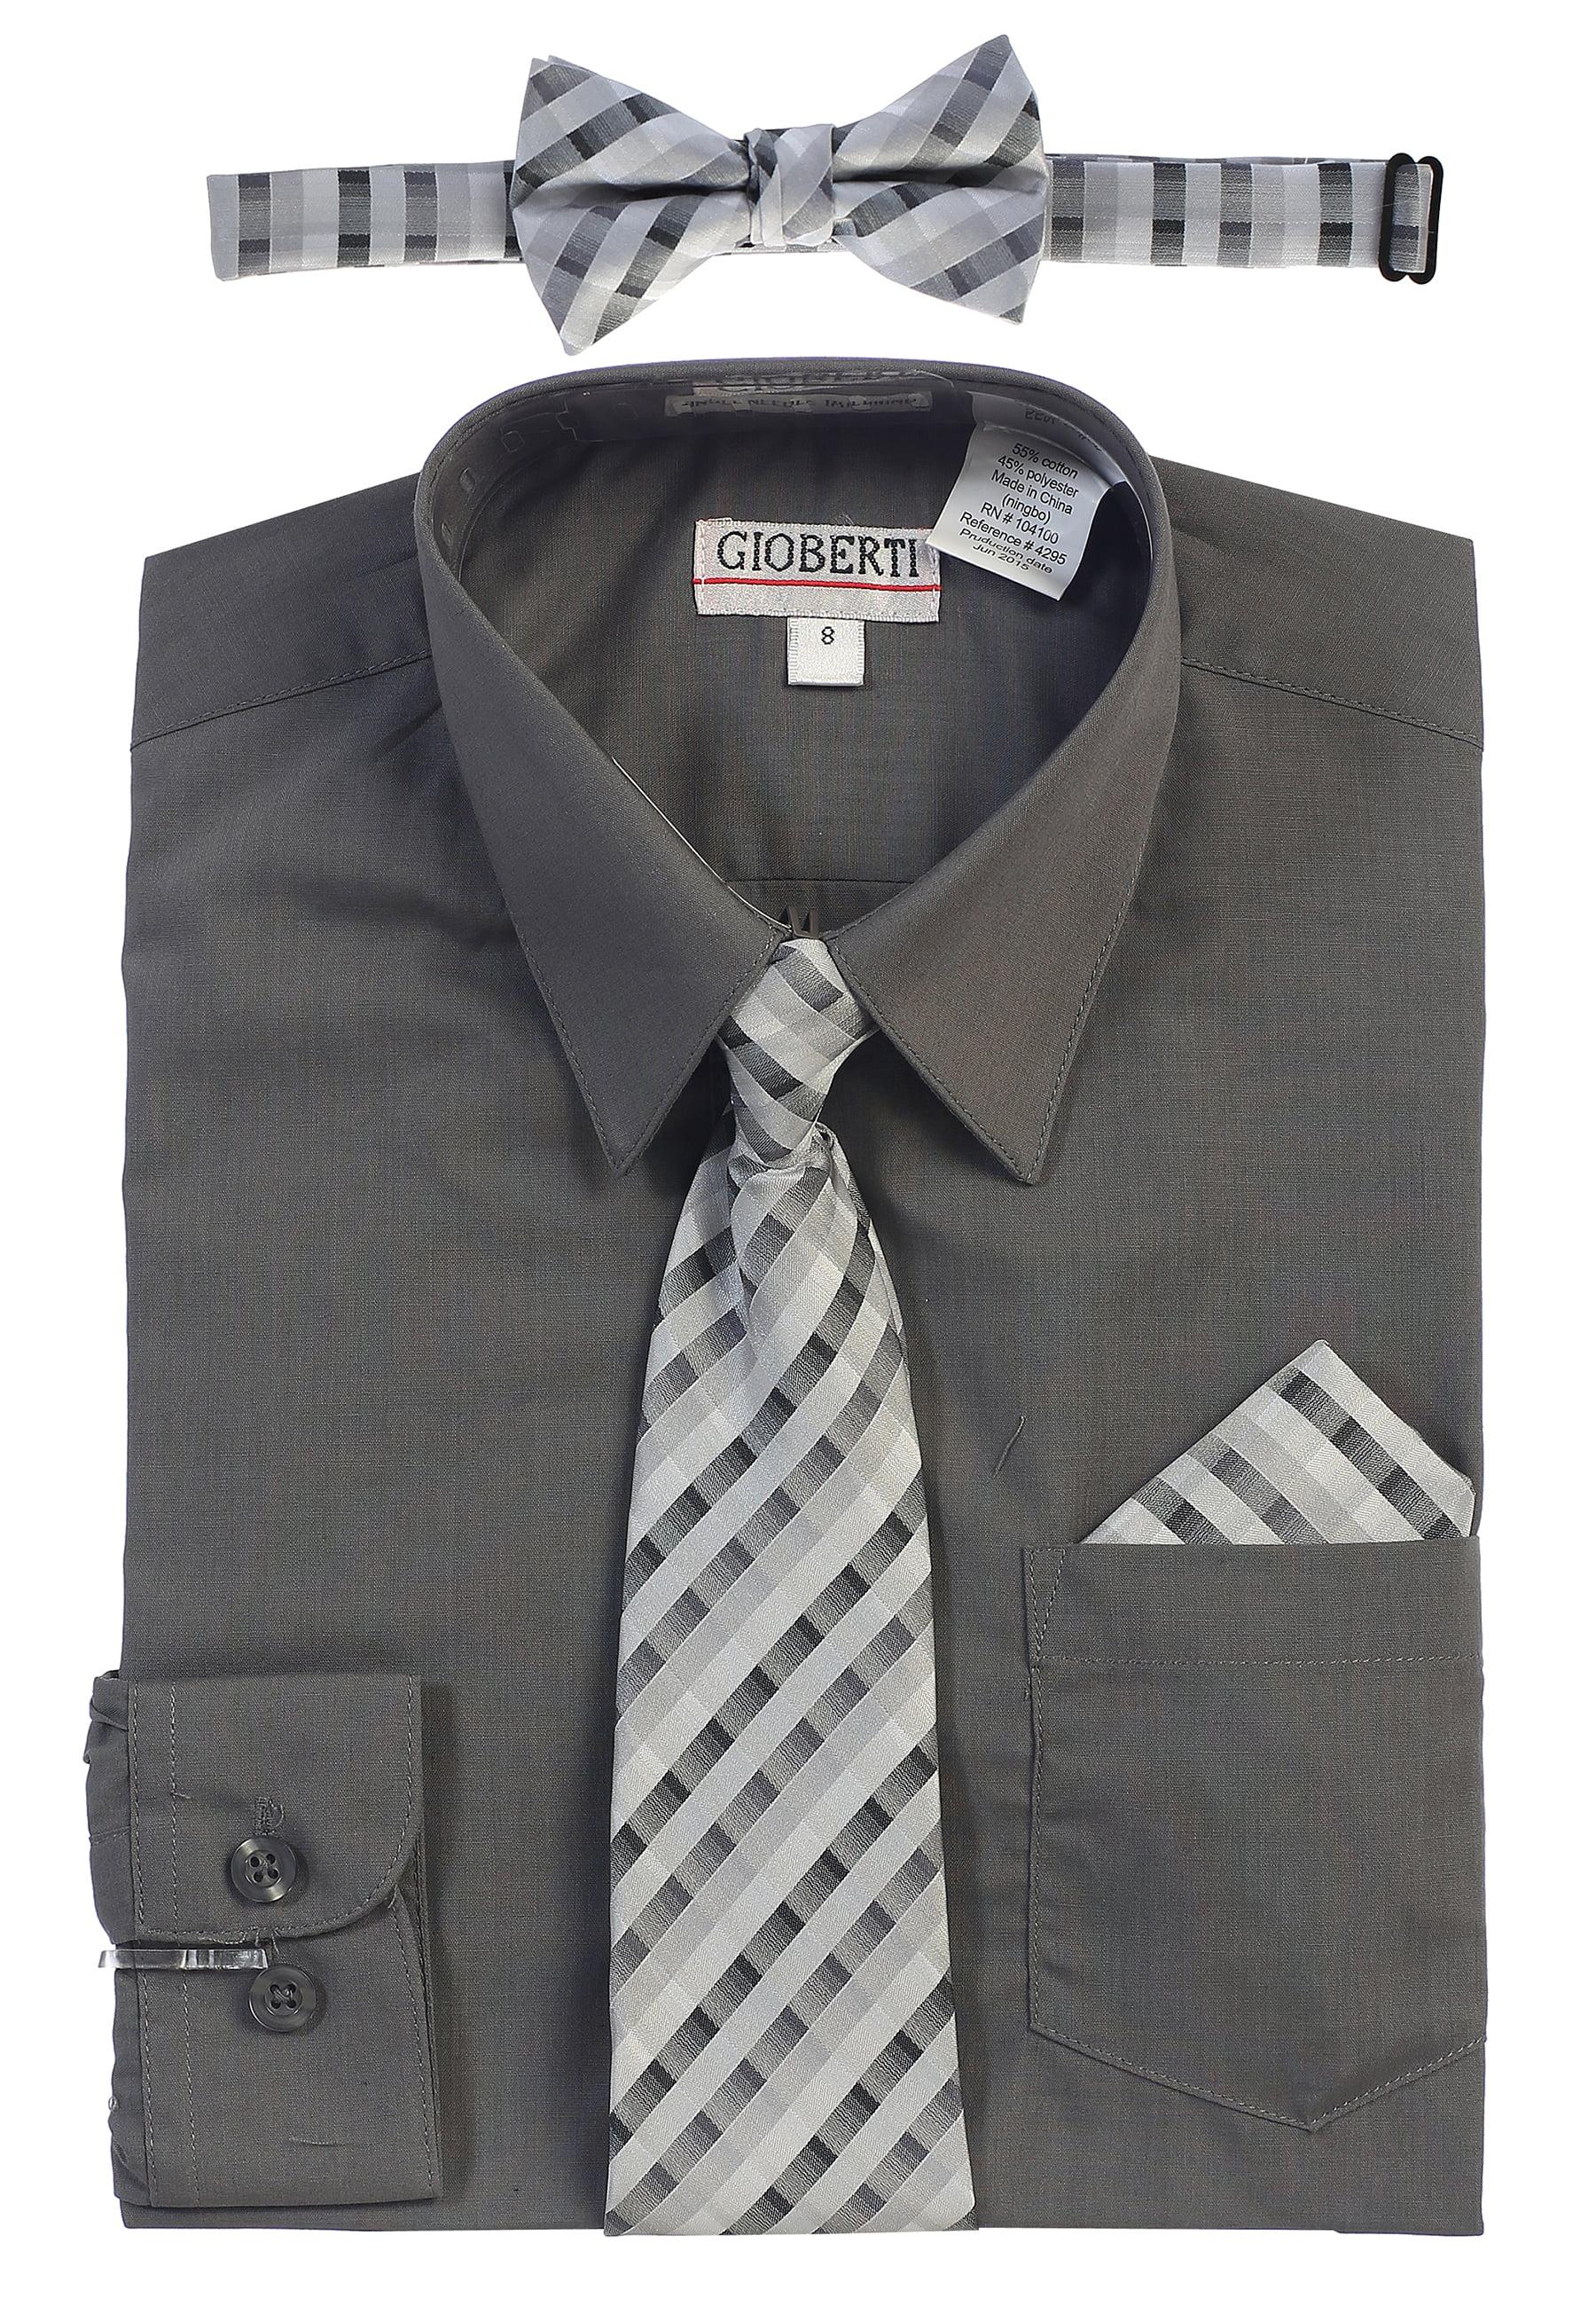 242ab7480e7ad0 Gioberti - Gioberti Boy's Long Sleeve Dress Shirt and Tie Set - Walmart.com